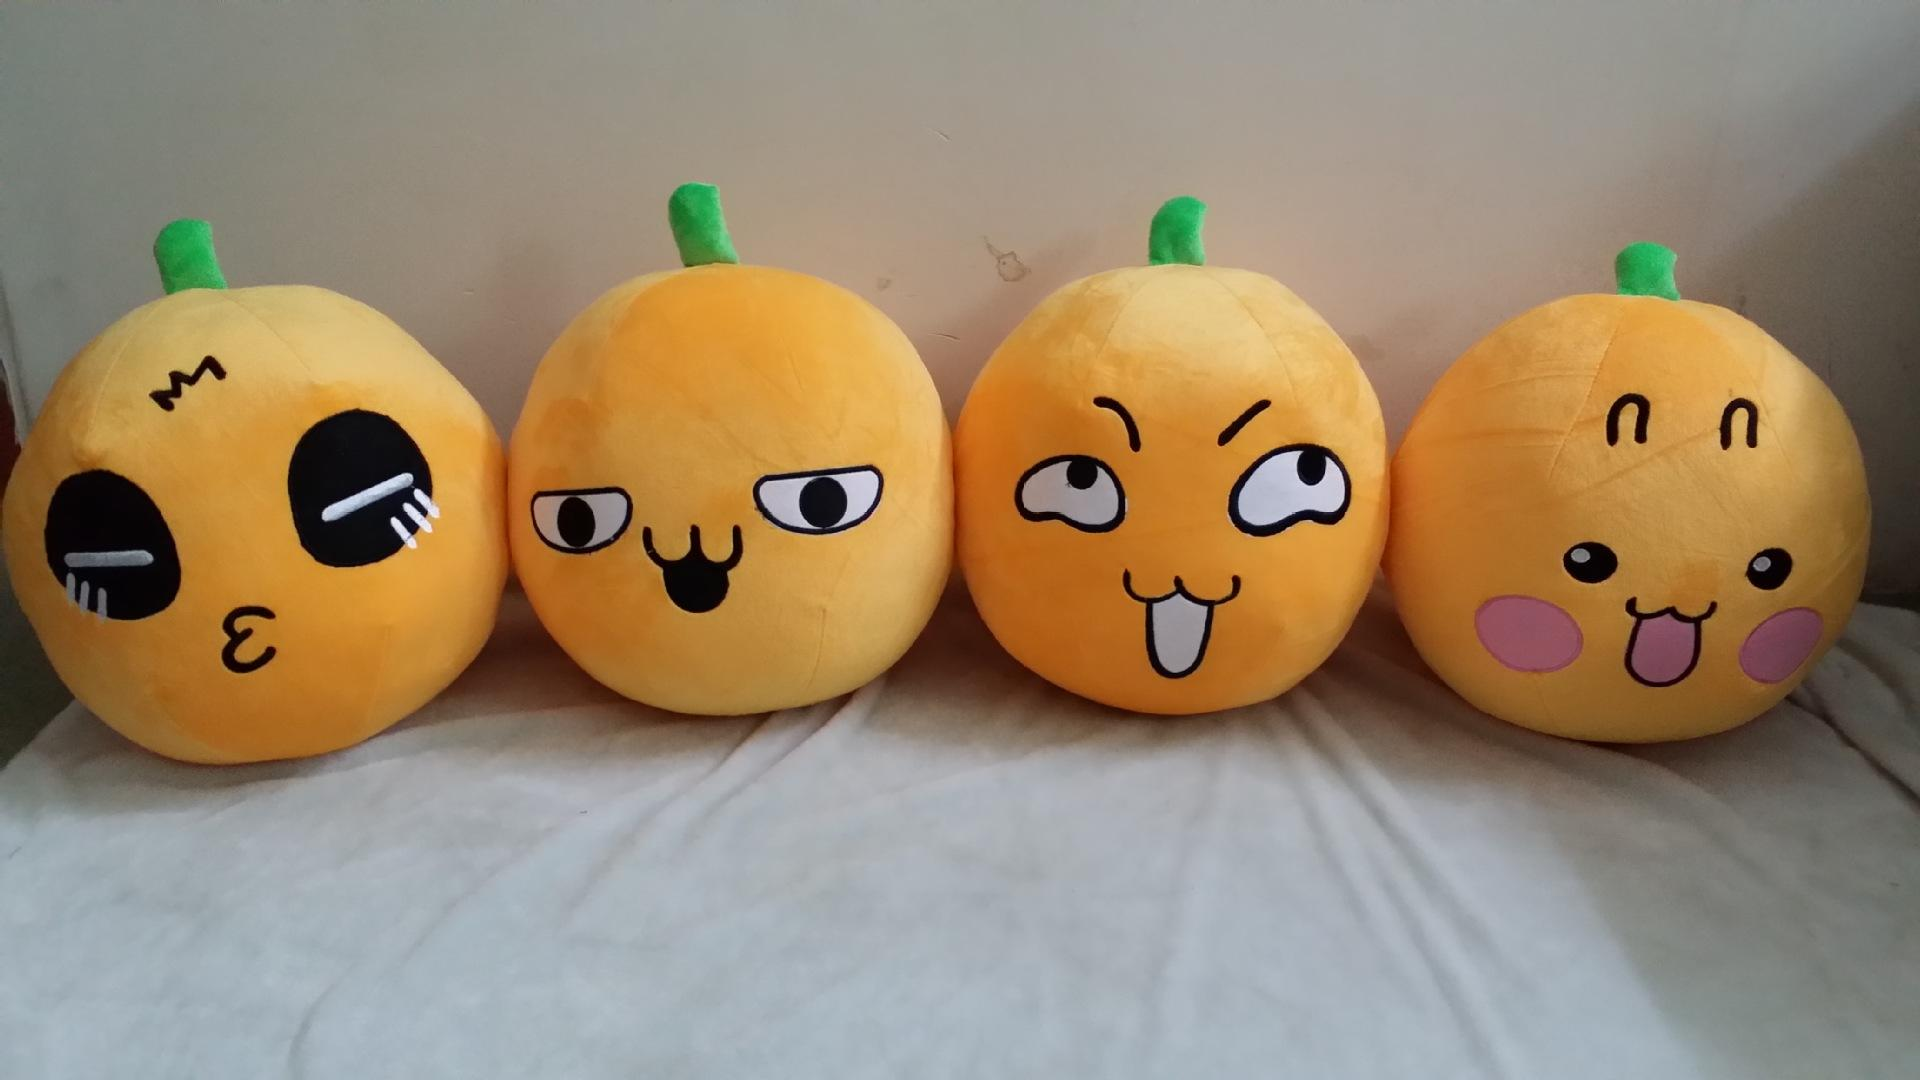 Pumpkin Face cushion Lovely Emoji Smiley throw pillow Stuffed